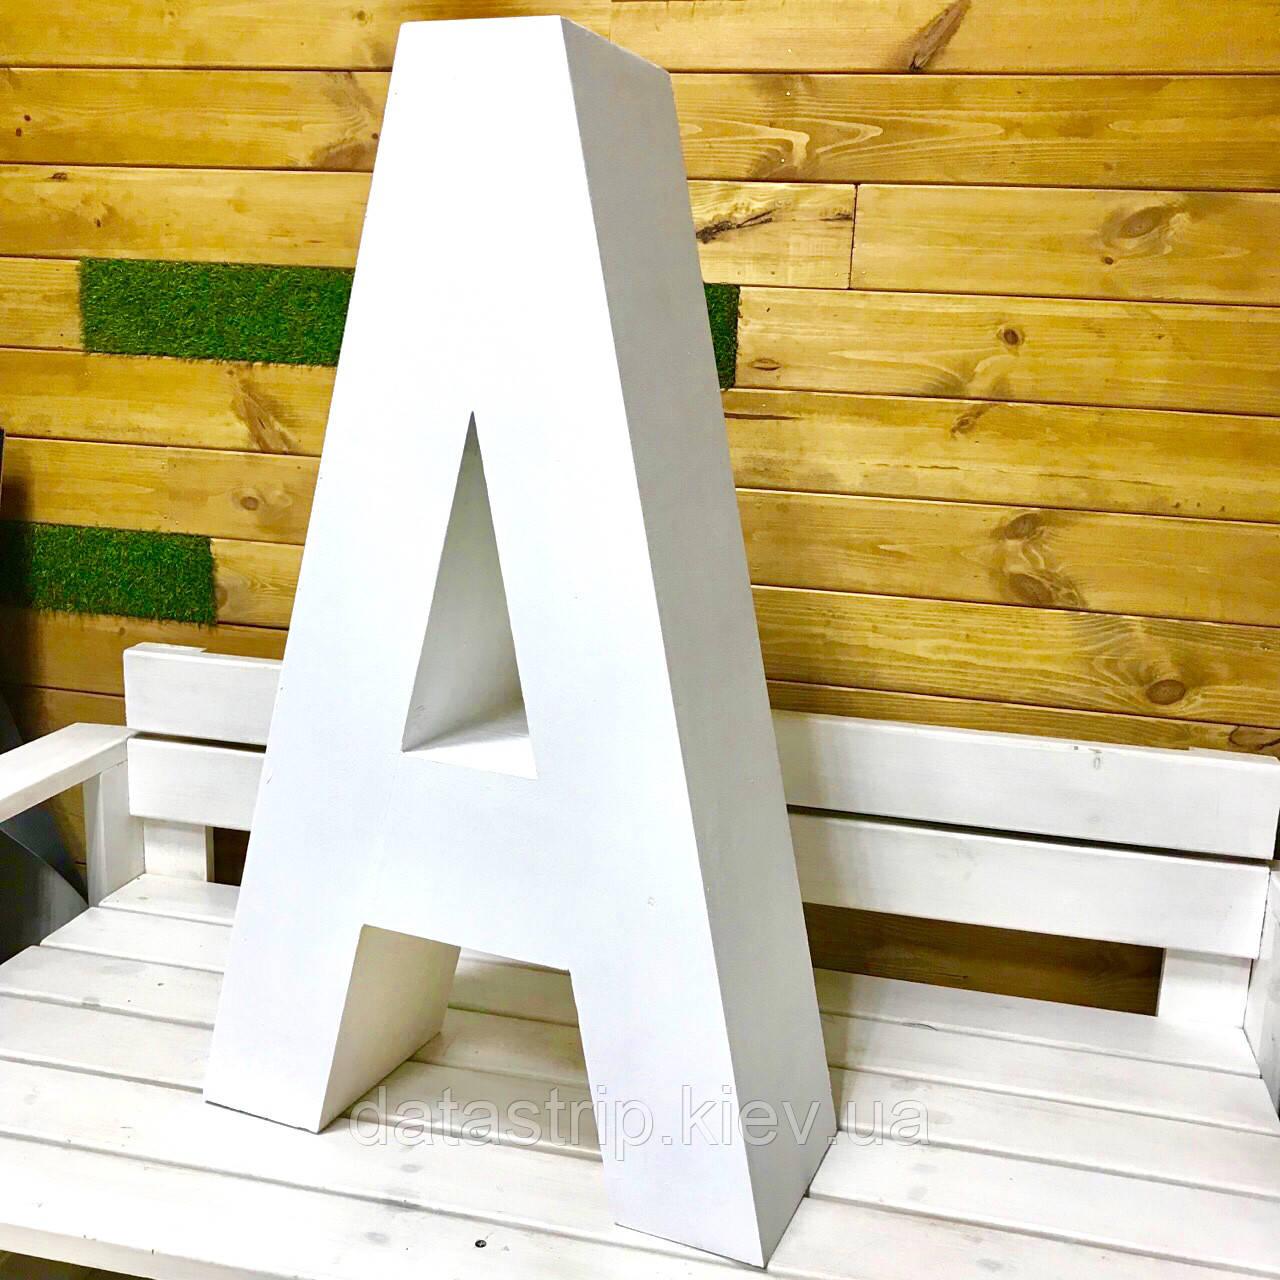 Буква, цифра из полистирола, толщина 20 см